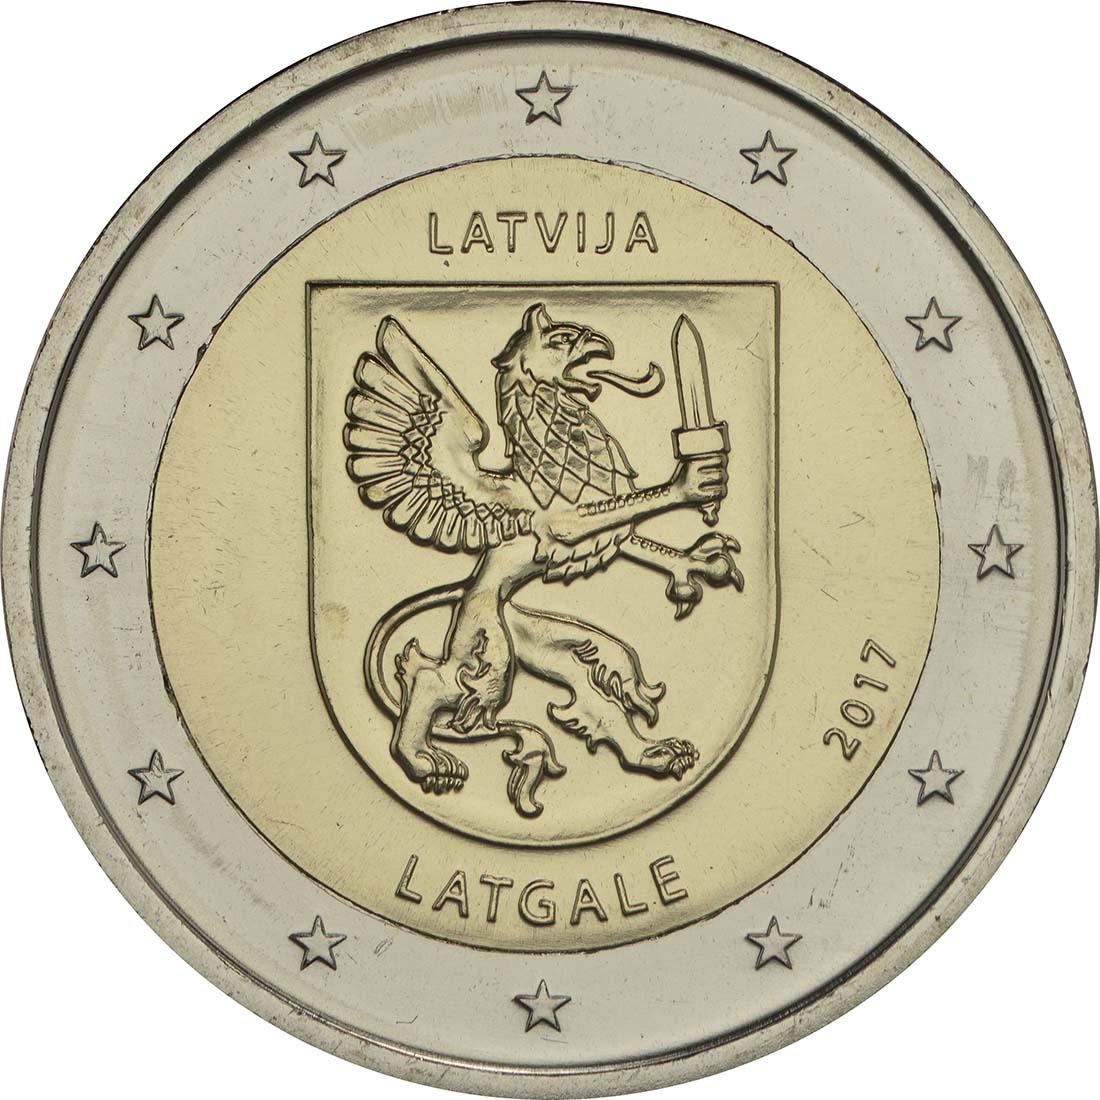 2017 292 Lettland Latgale.jpg